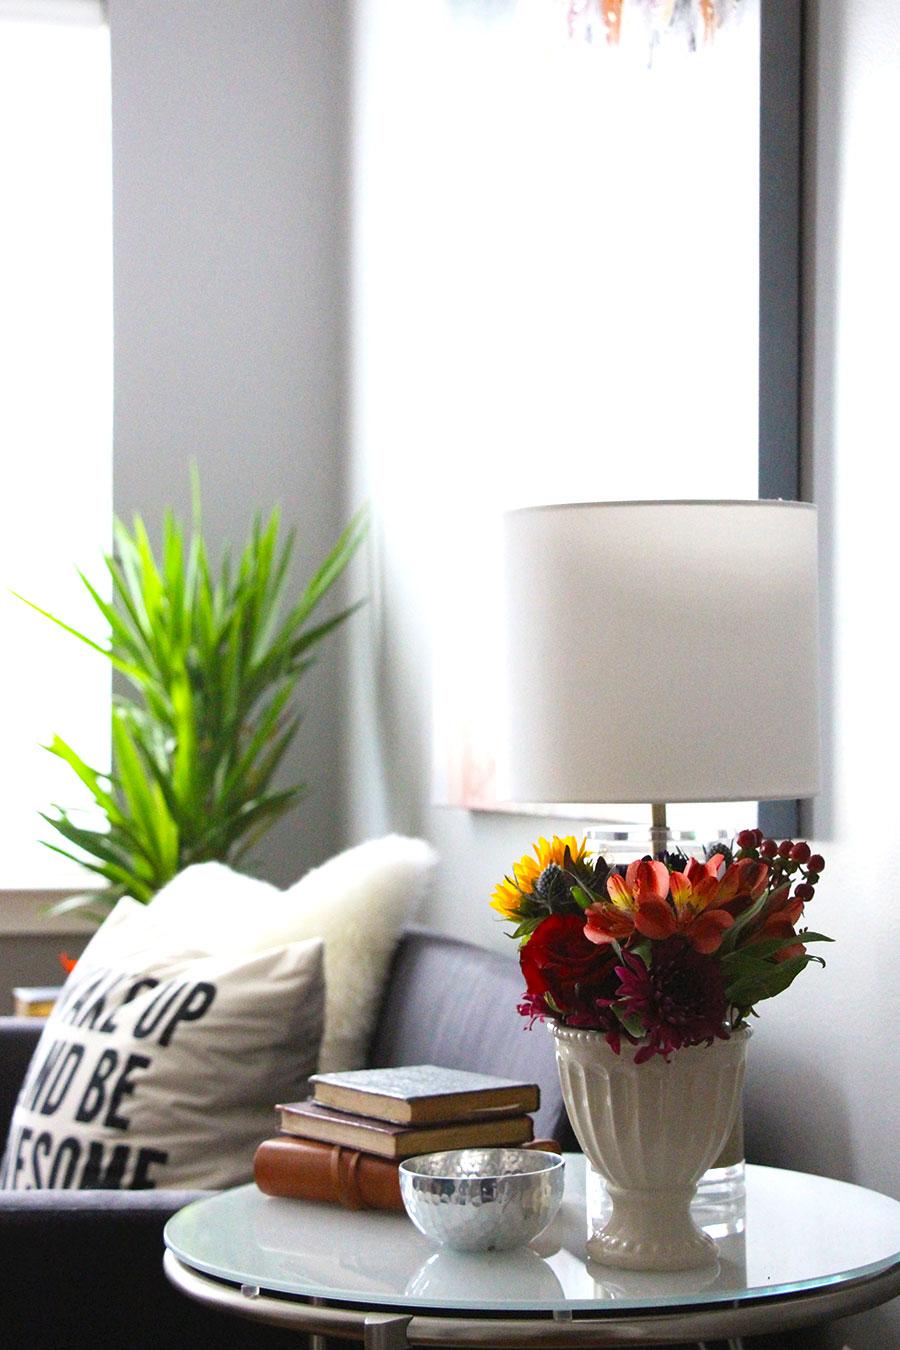 home-office-decor-splendor-styling-ikea-saofa-bed.jpg